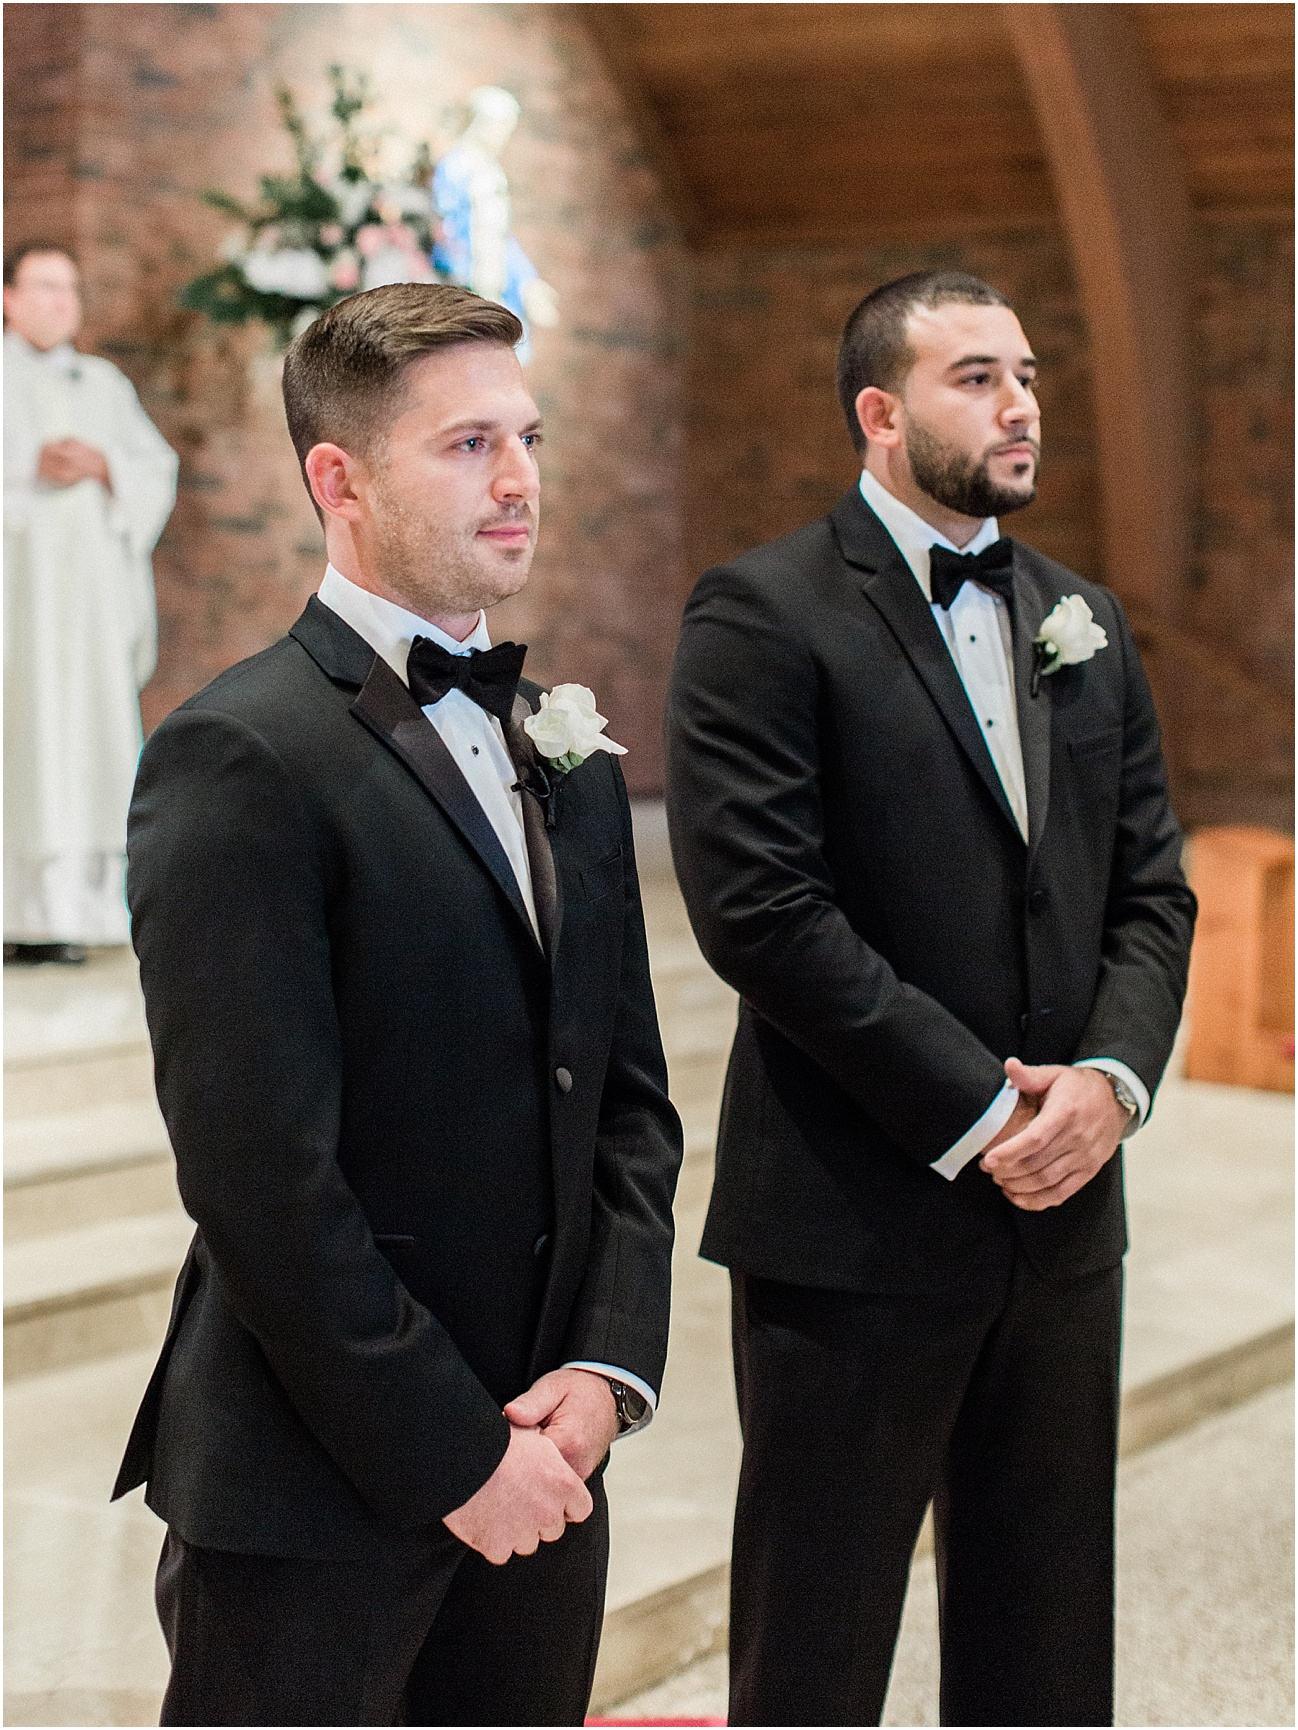 bianca_chris_danversport_italian_blush_gold_north_shore_cape_cod_boston_wedding_photographer_meredith_jane_photography_photo_1114.jpg